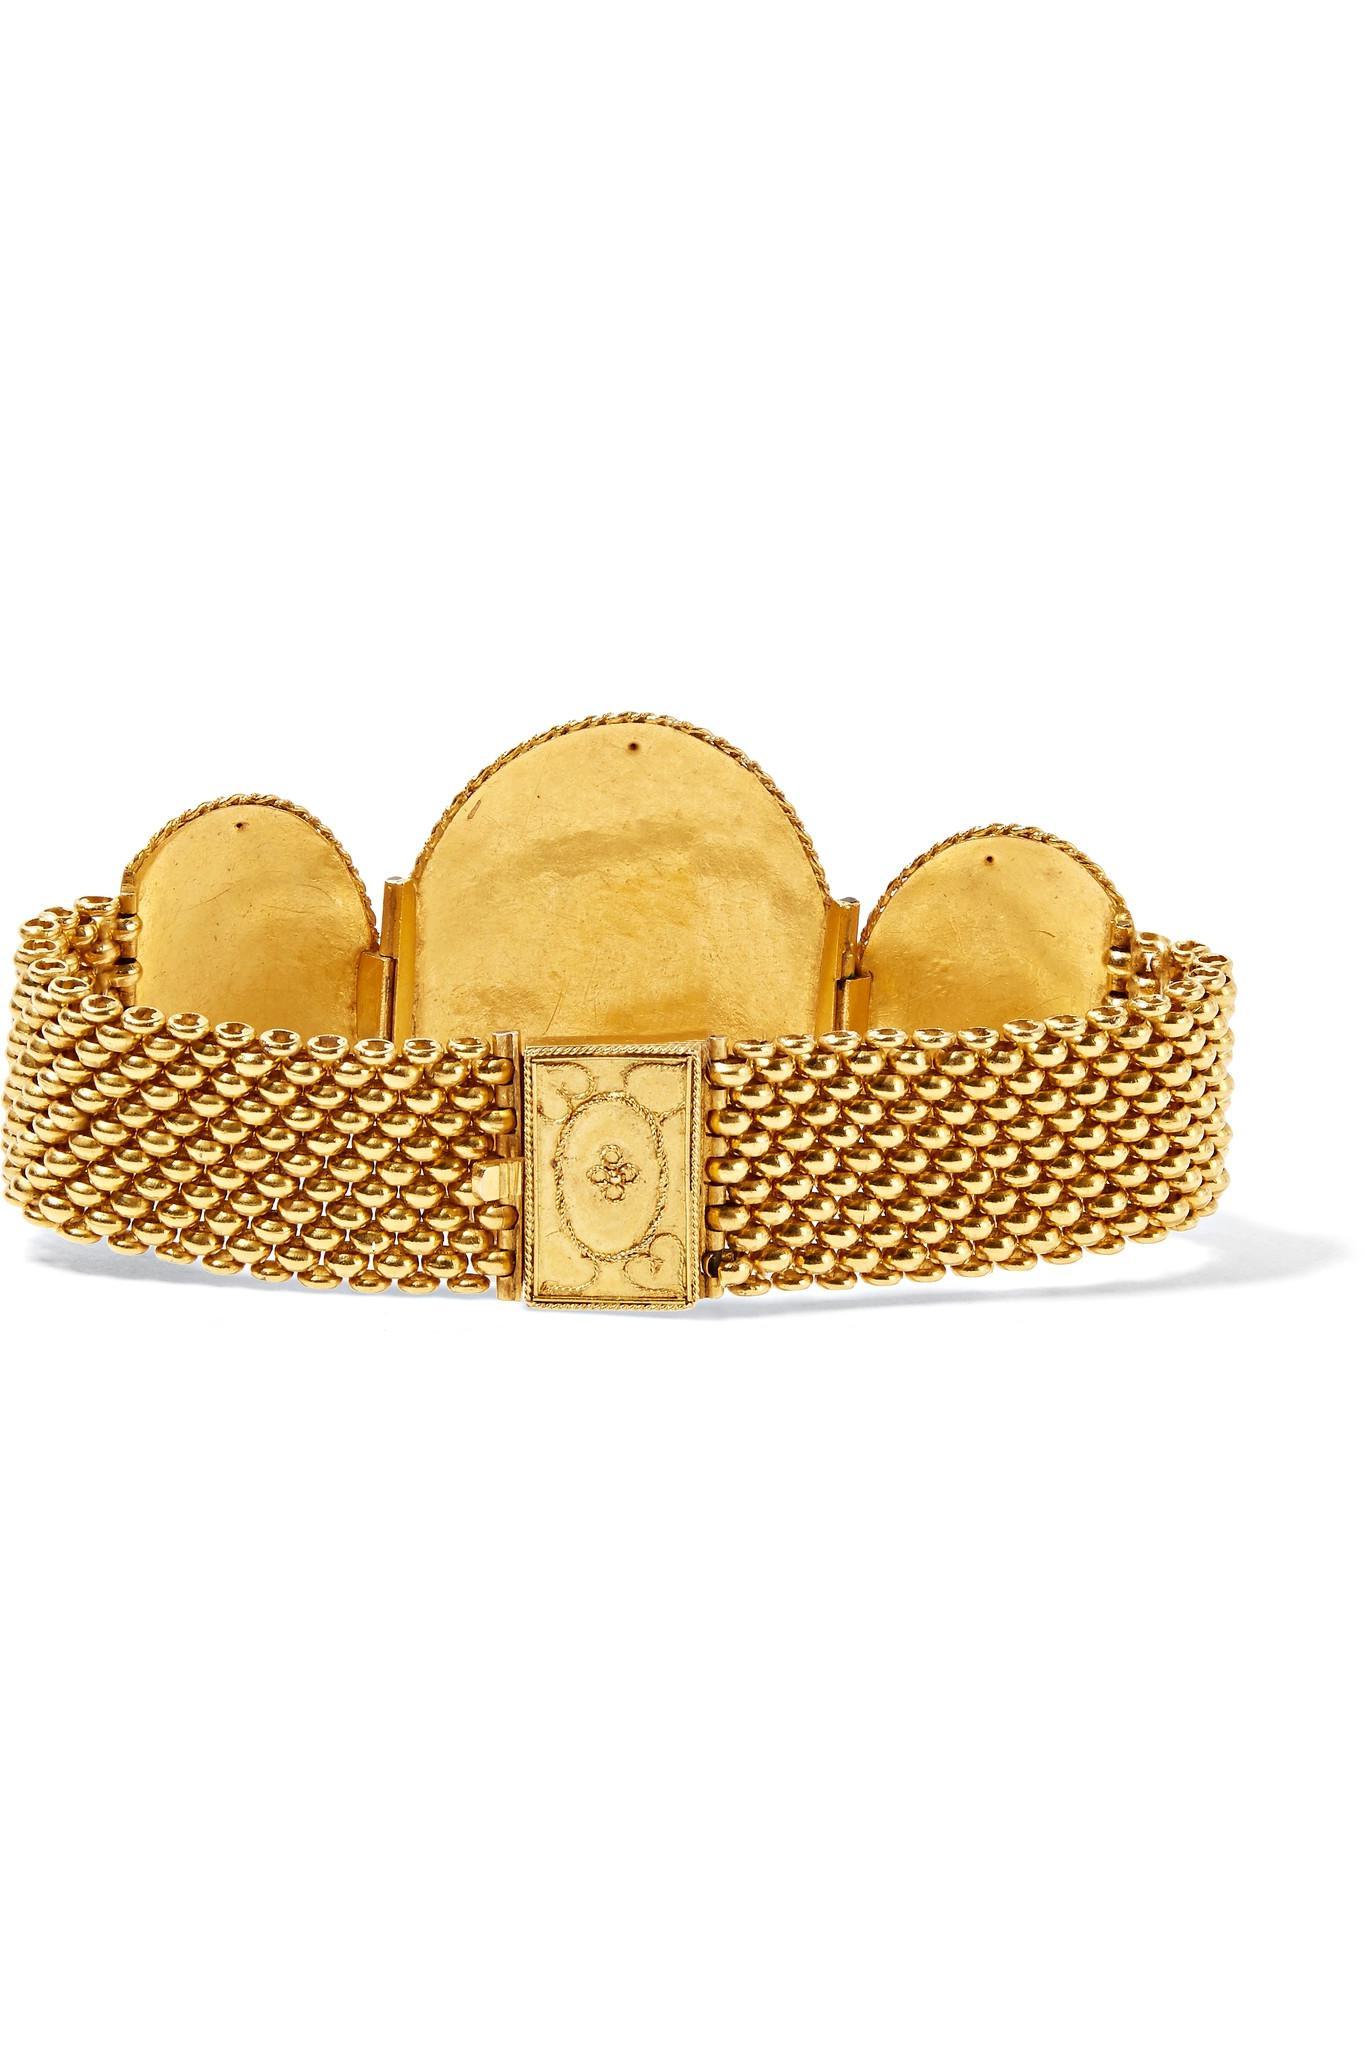 Fred Leighton 1880s 18-karat Gold Bracelet yKhWILDi4r